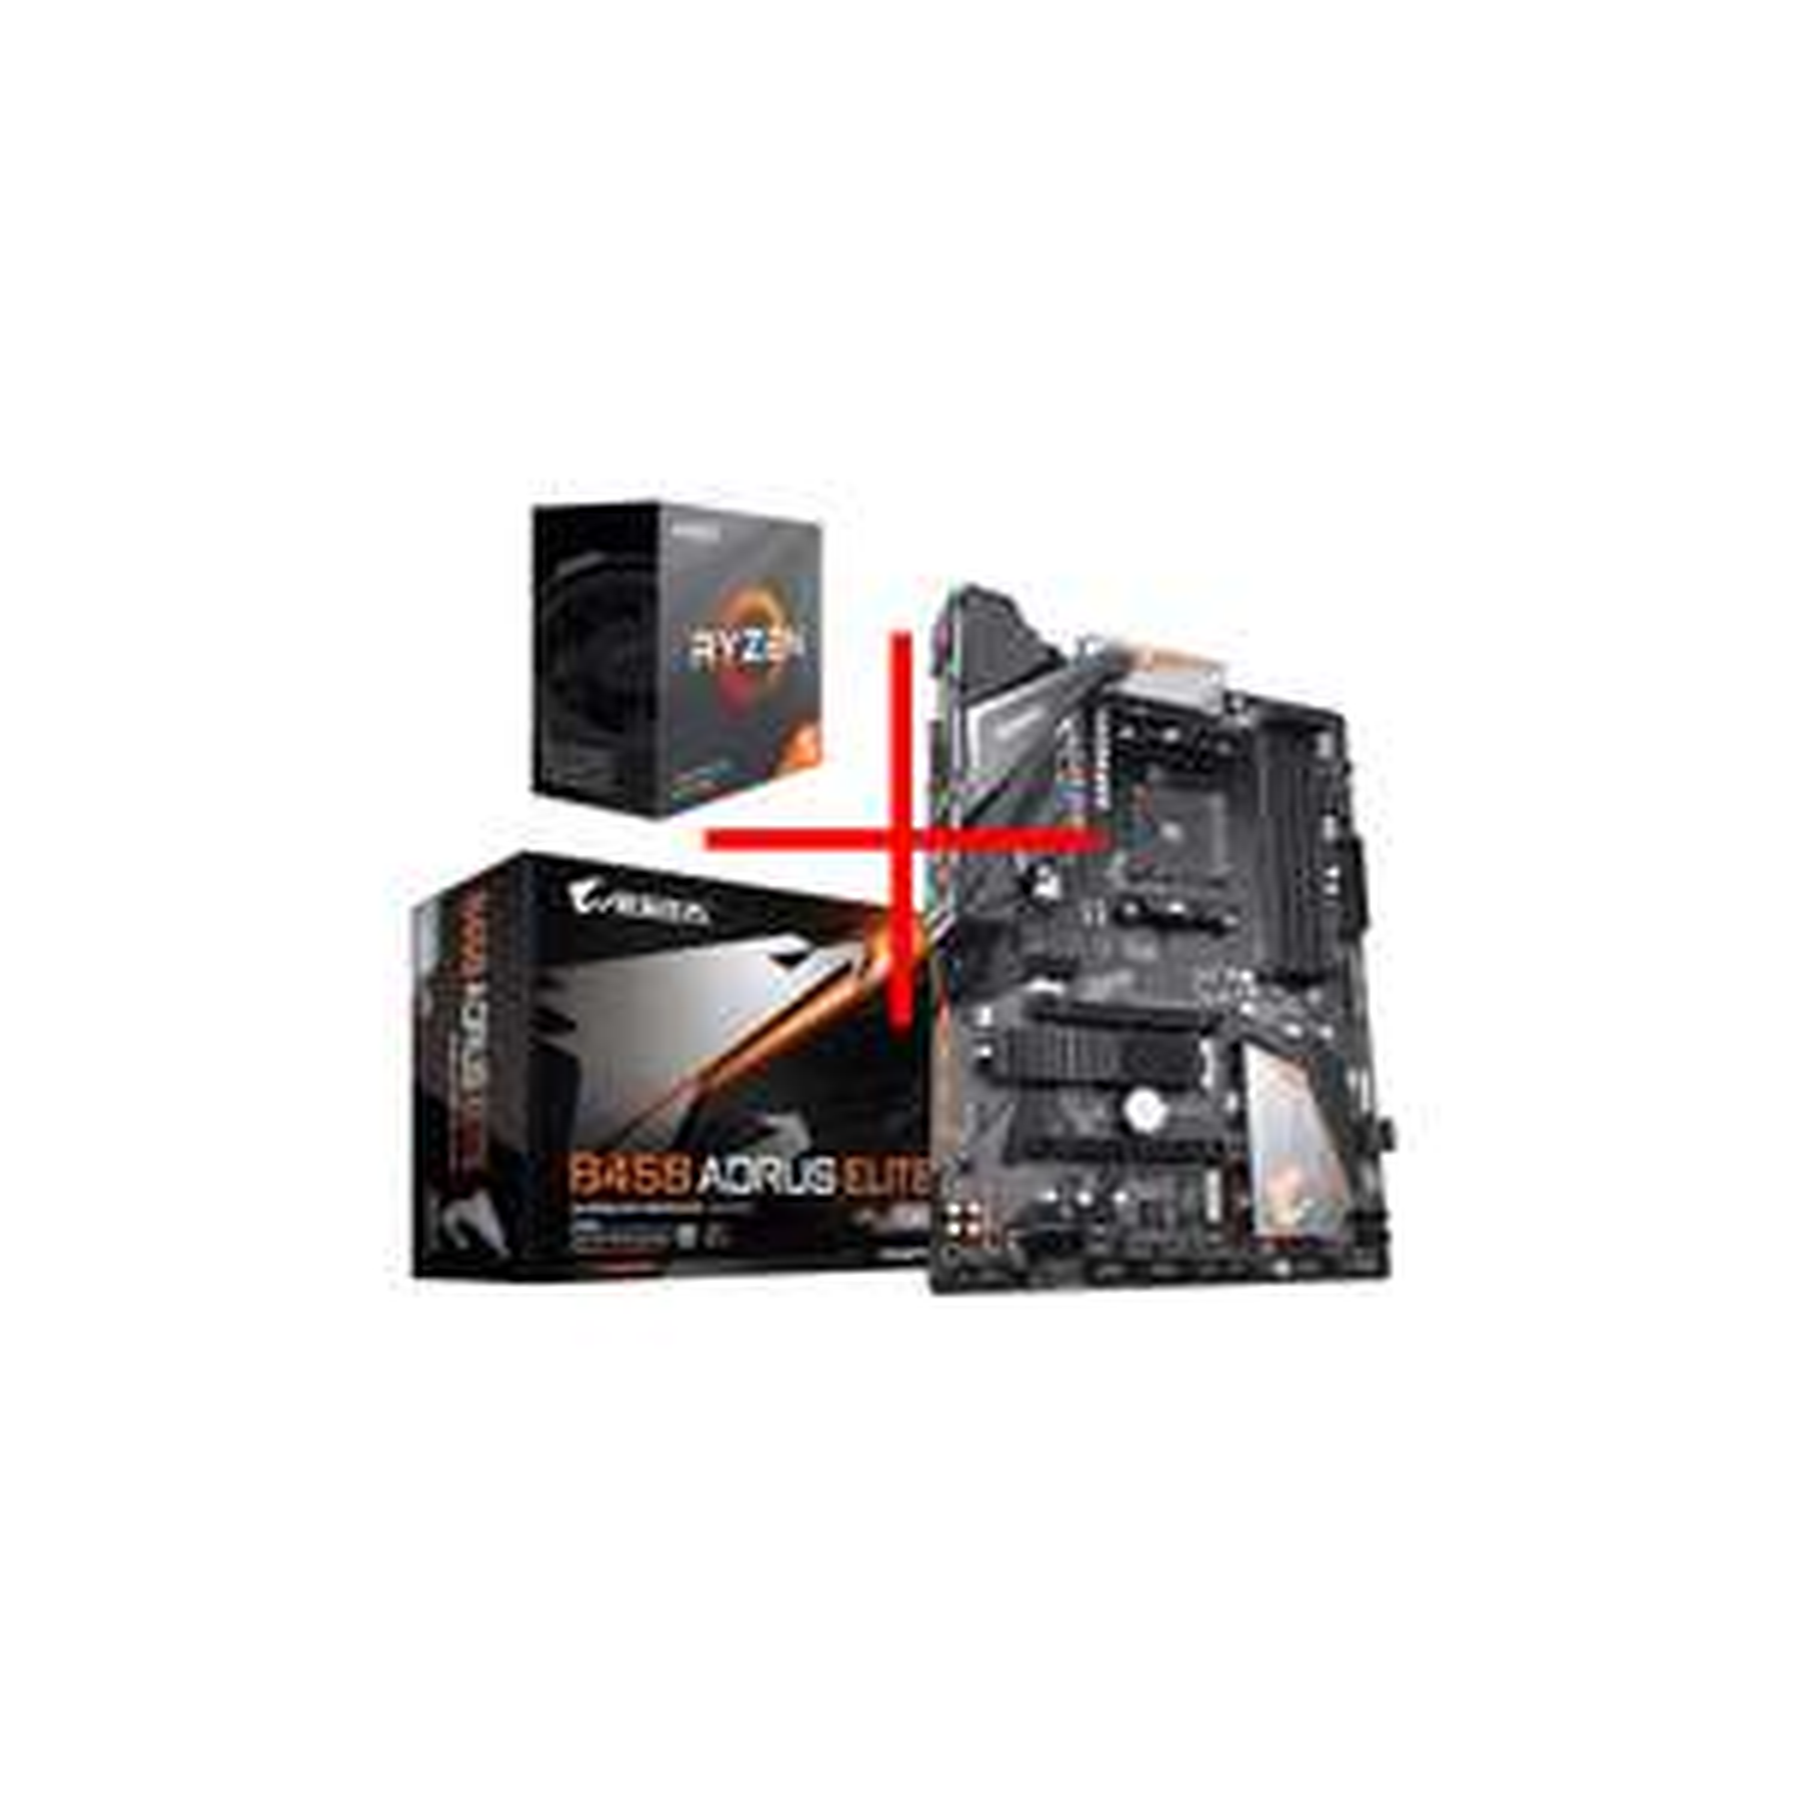 Kit évo Processeur Ryzen 5 3600 + Carte Mère Gigabyte B450 Aorus Elite